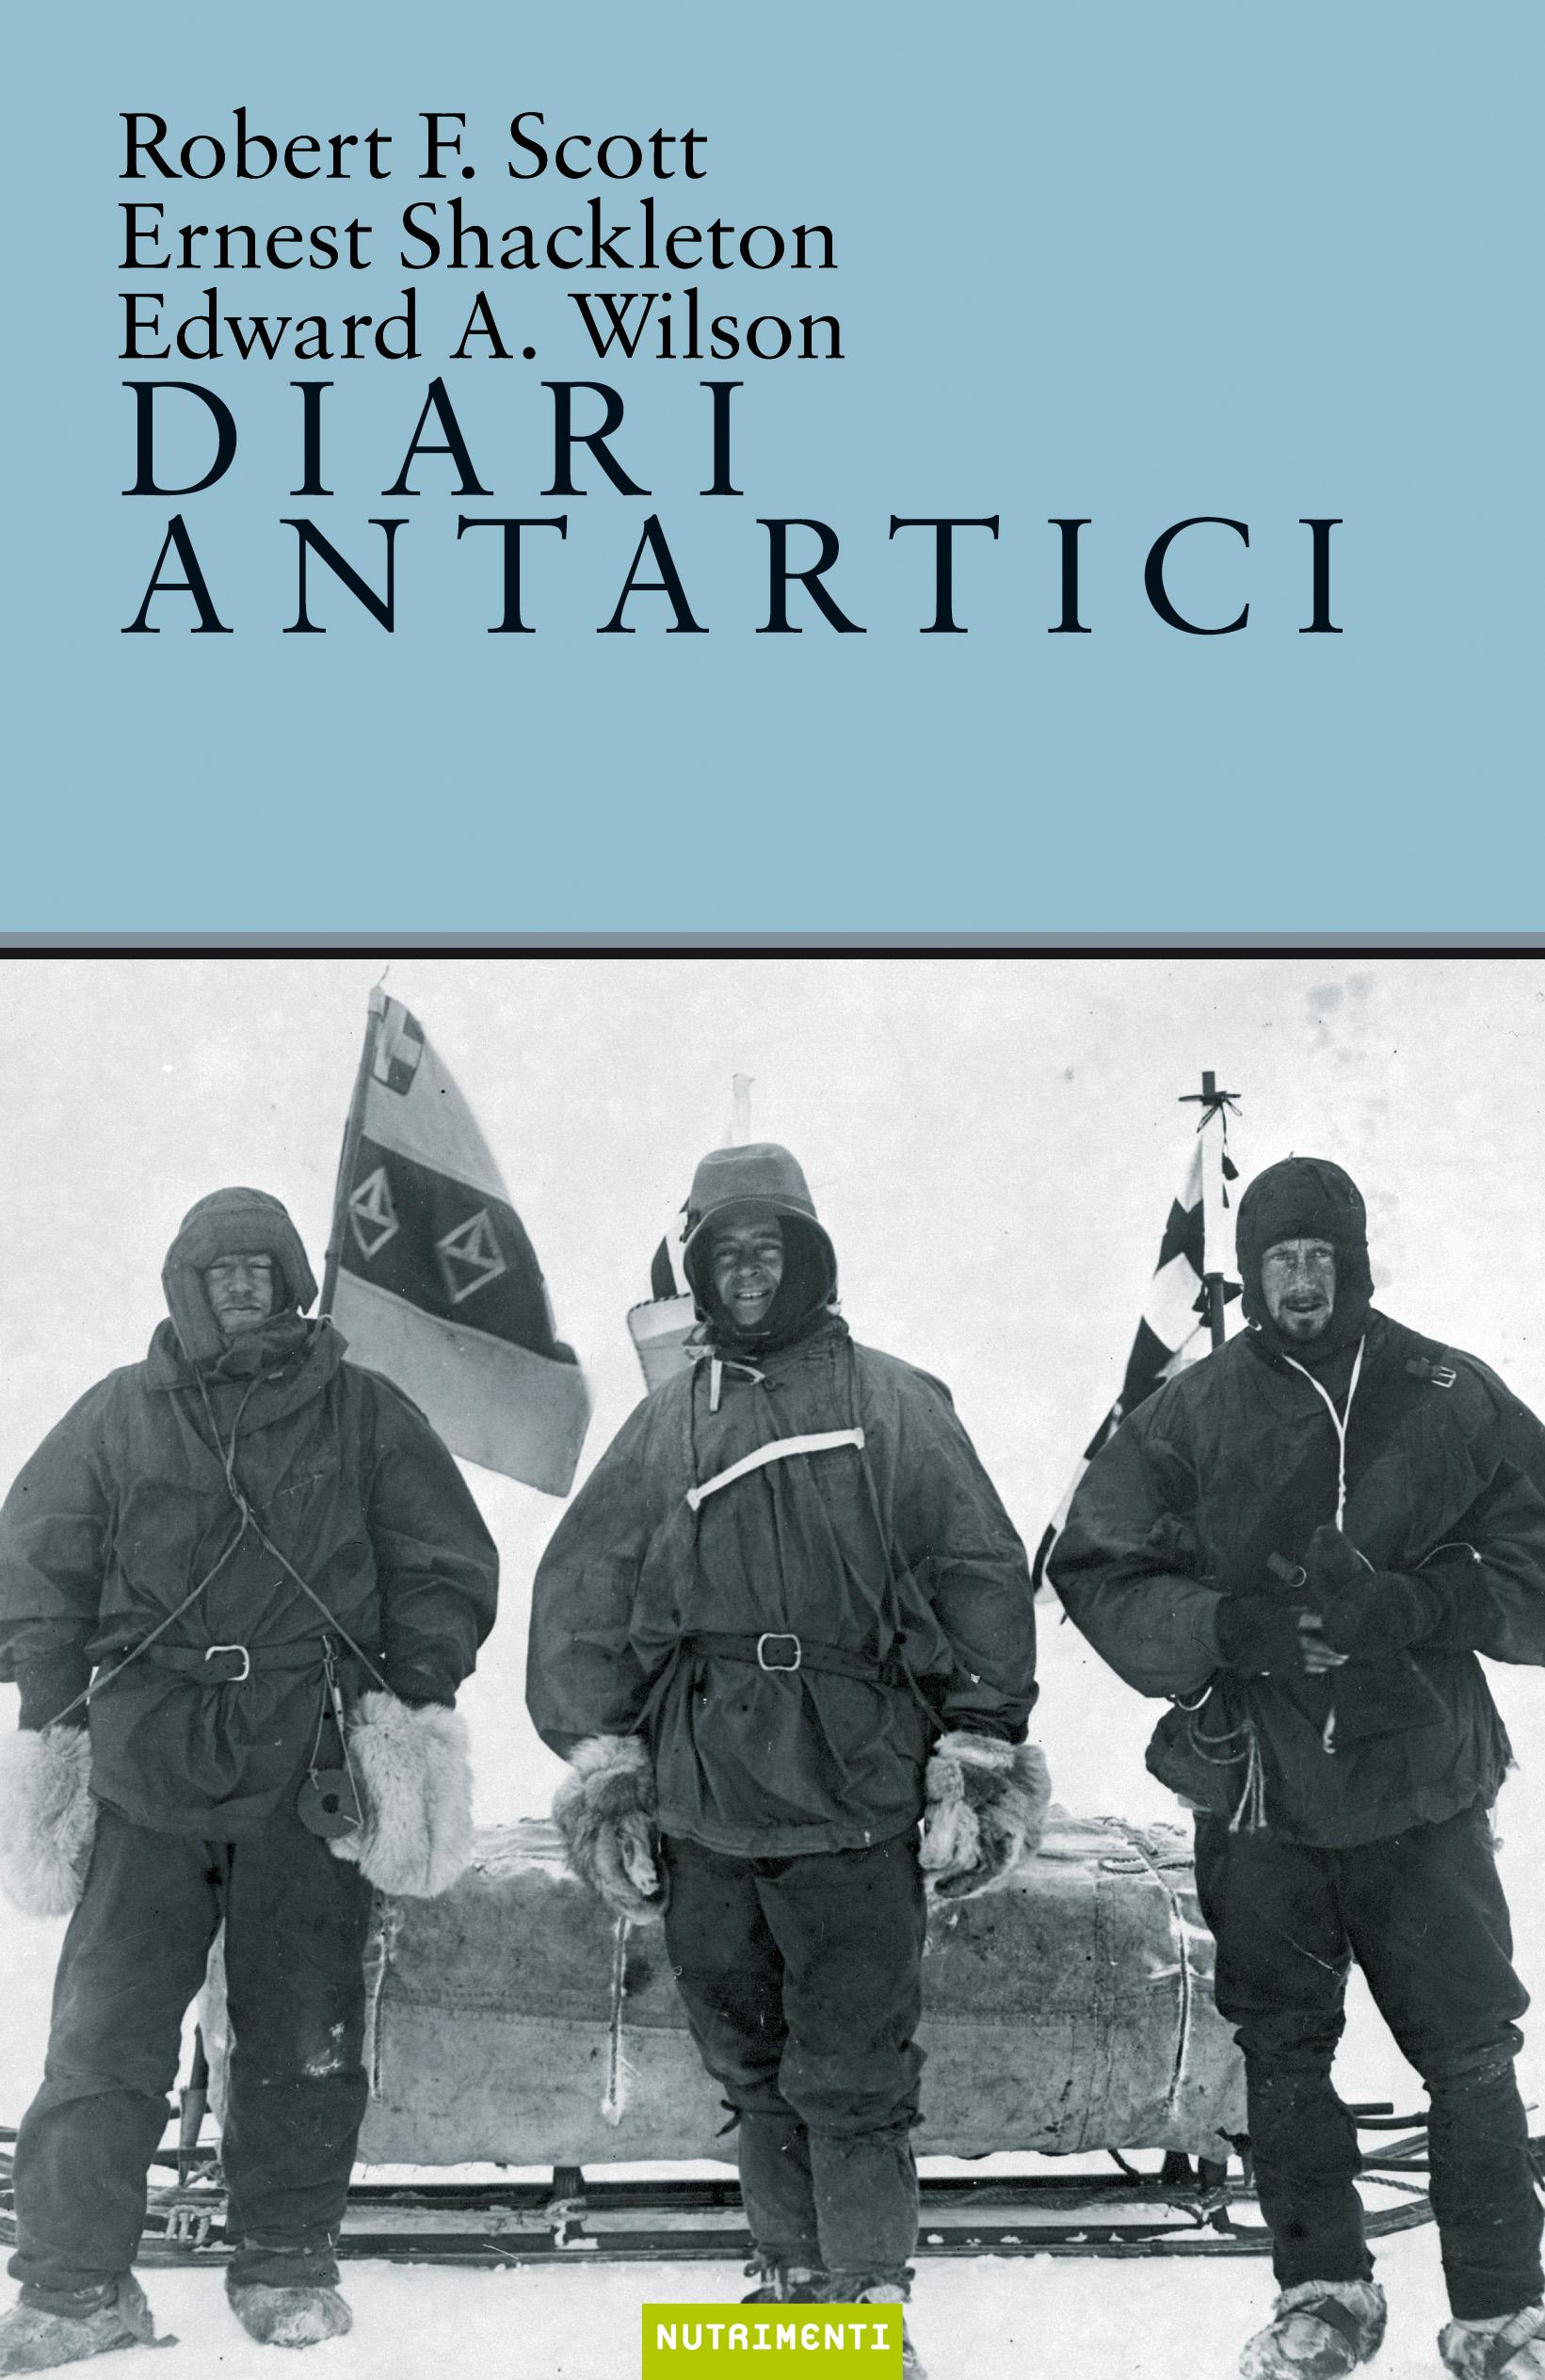 Diari antartici